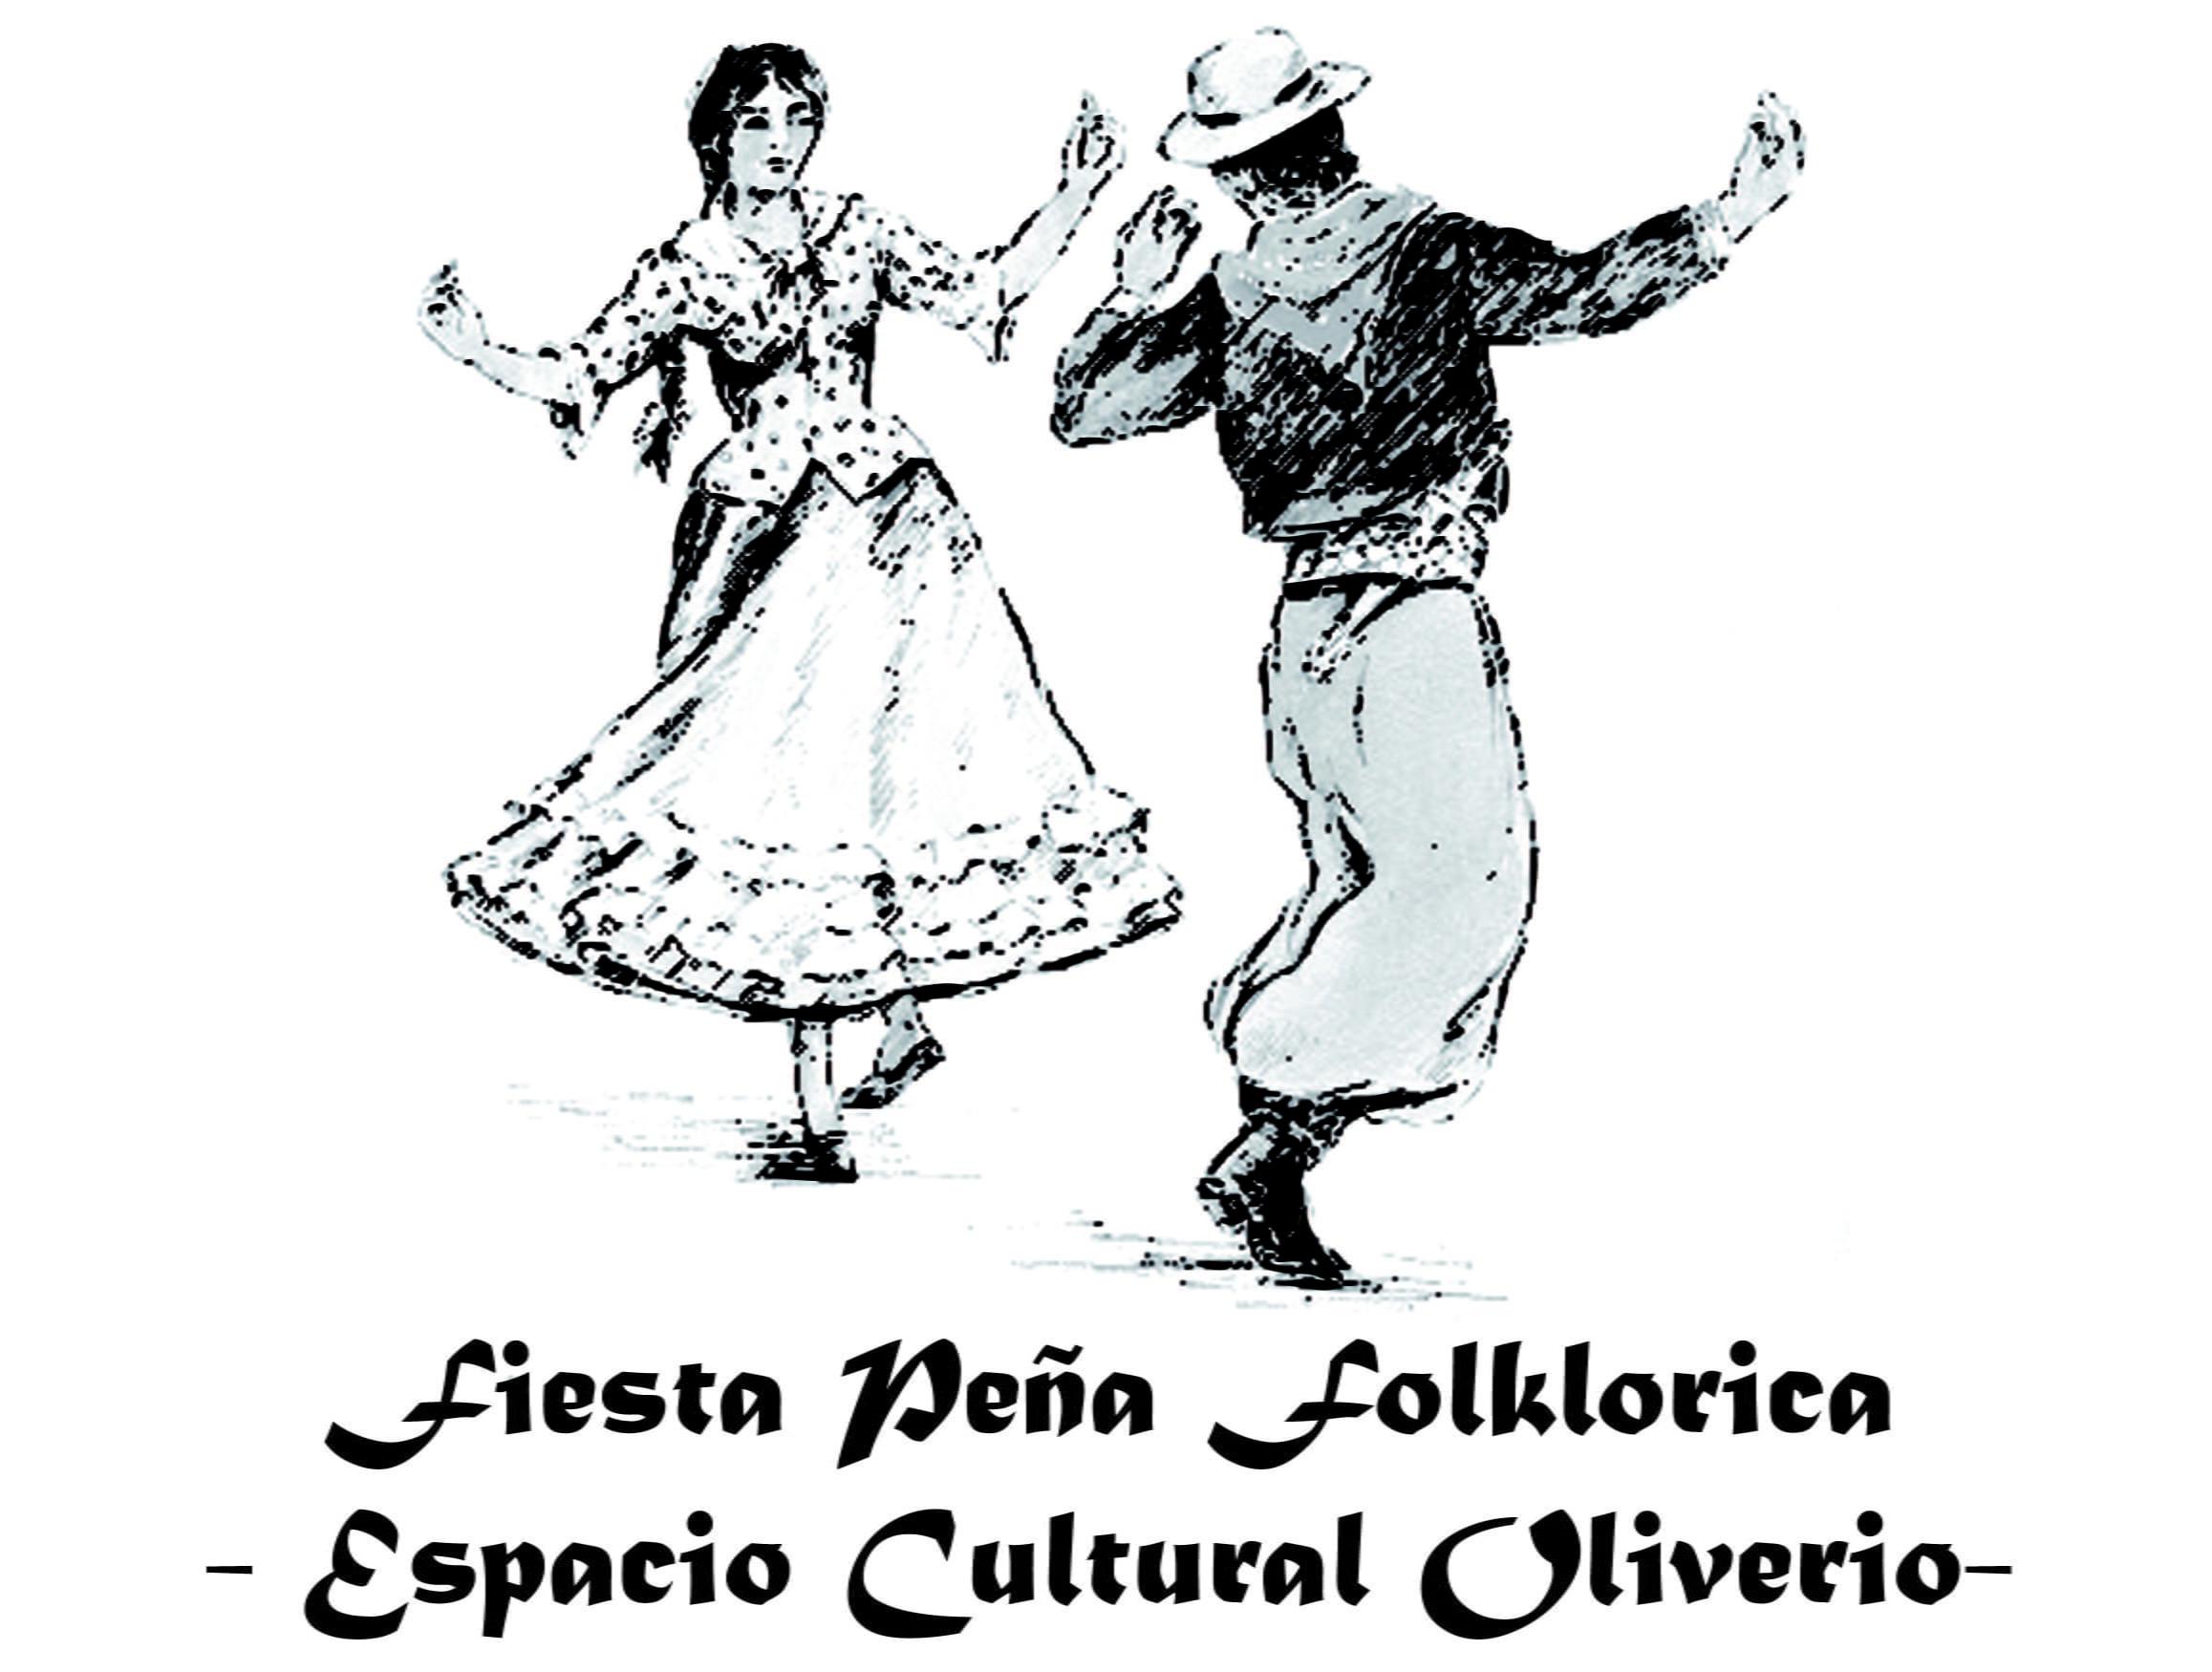 Fiesta Pena Folklorica